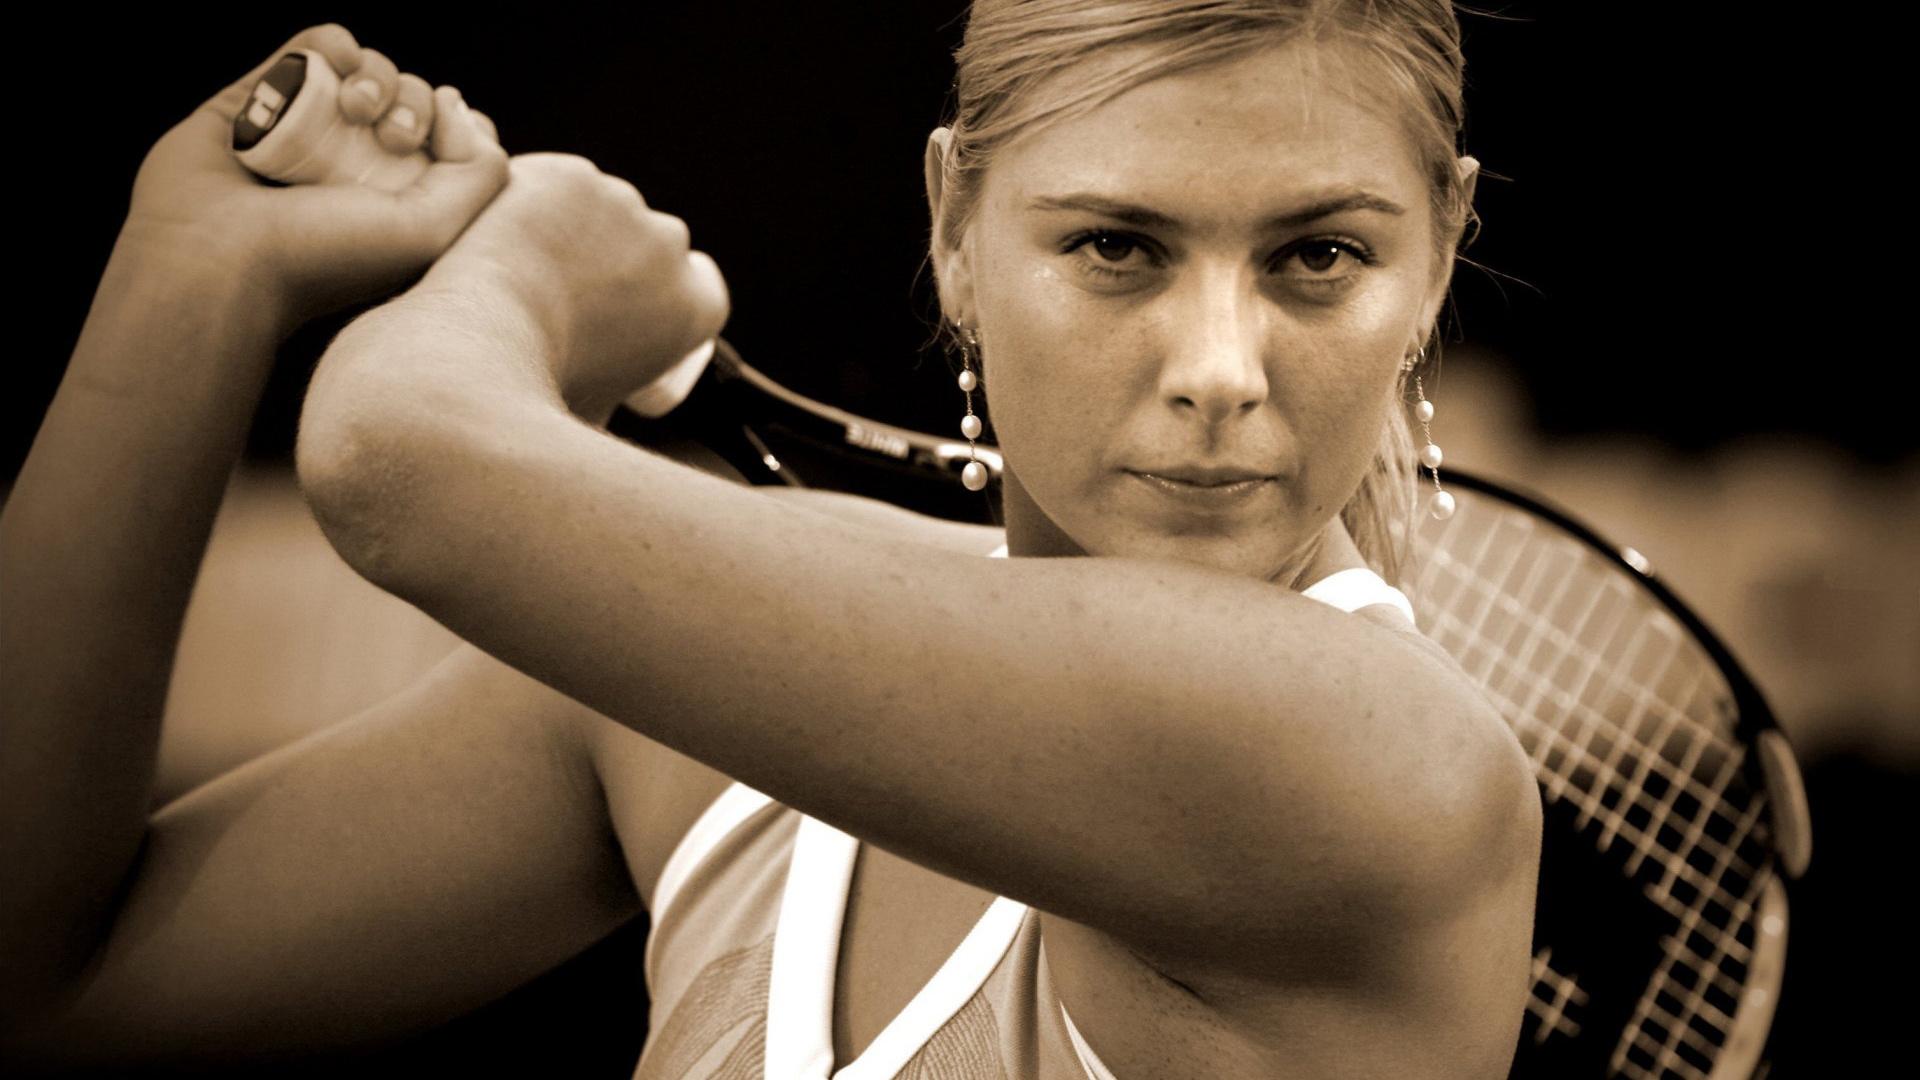 Maria Sharapova 19 Widescreen Wallpaper